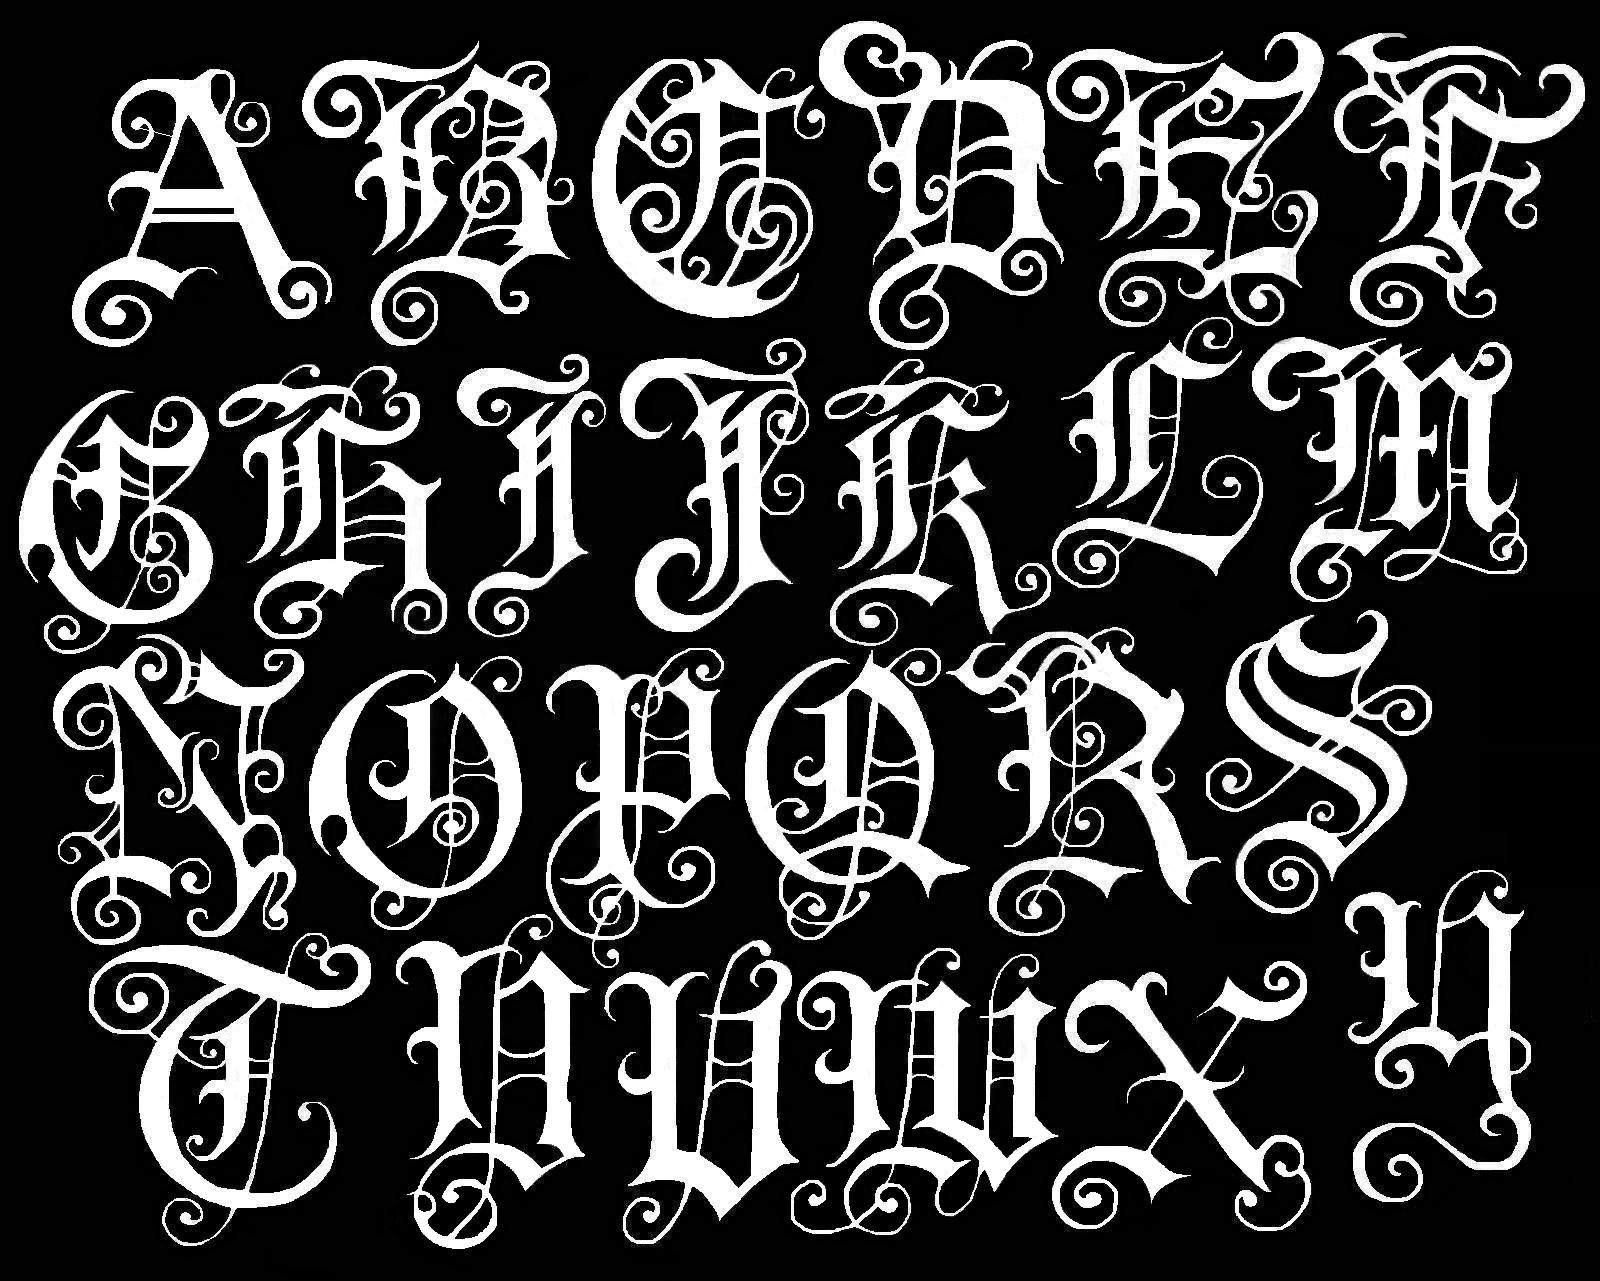 12 Graffiti Alphabet Fonts Free Images